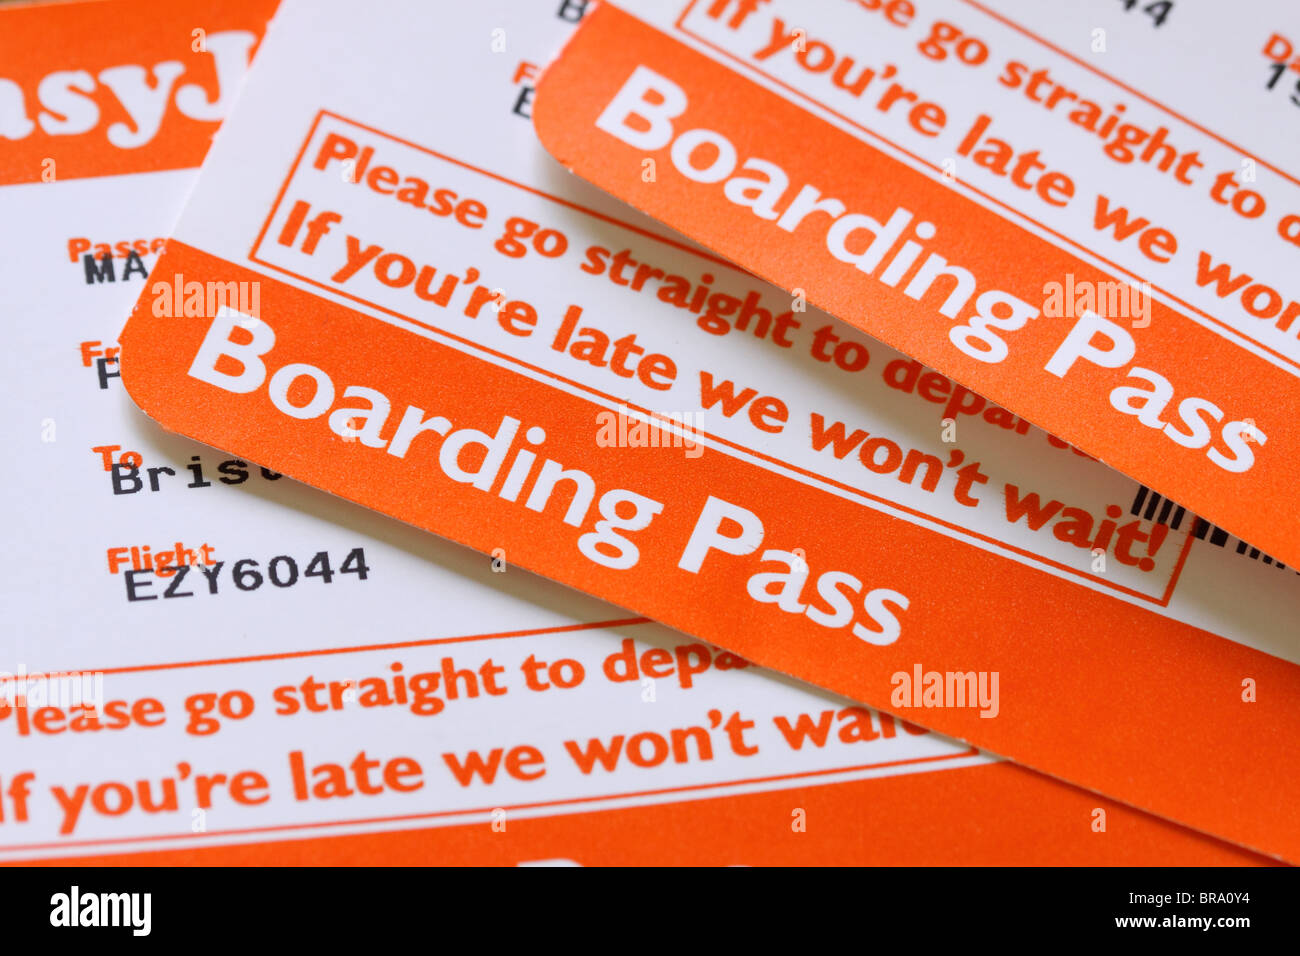 Boarding Pass Details Stock Photos Boarding Pass Details Stock